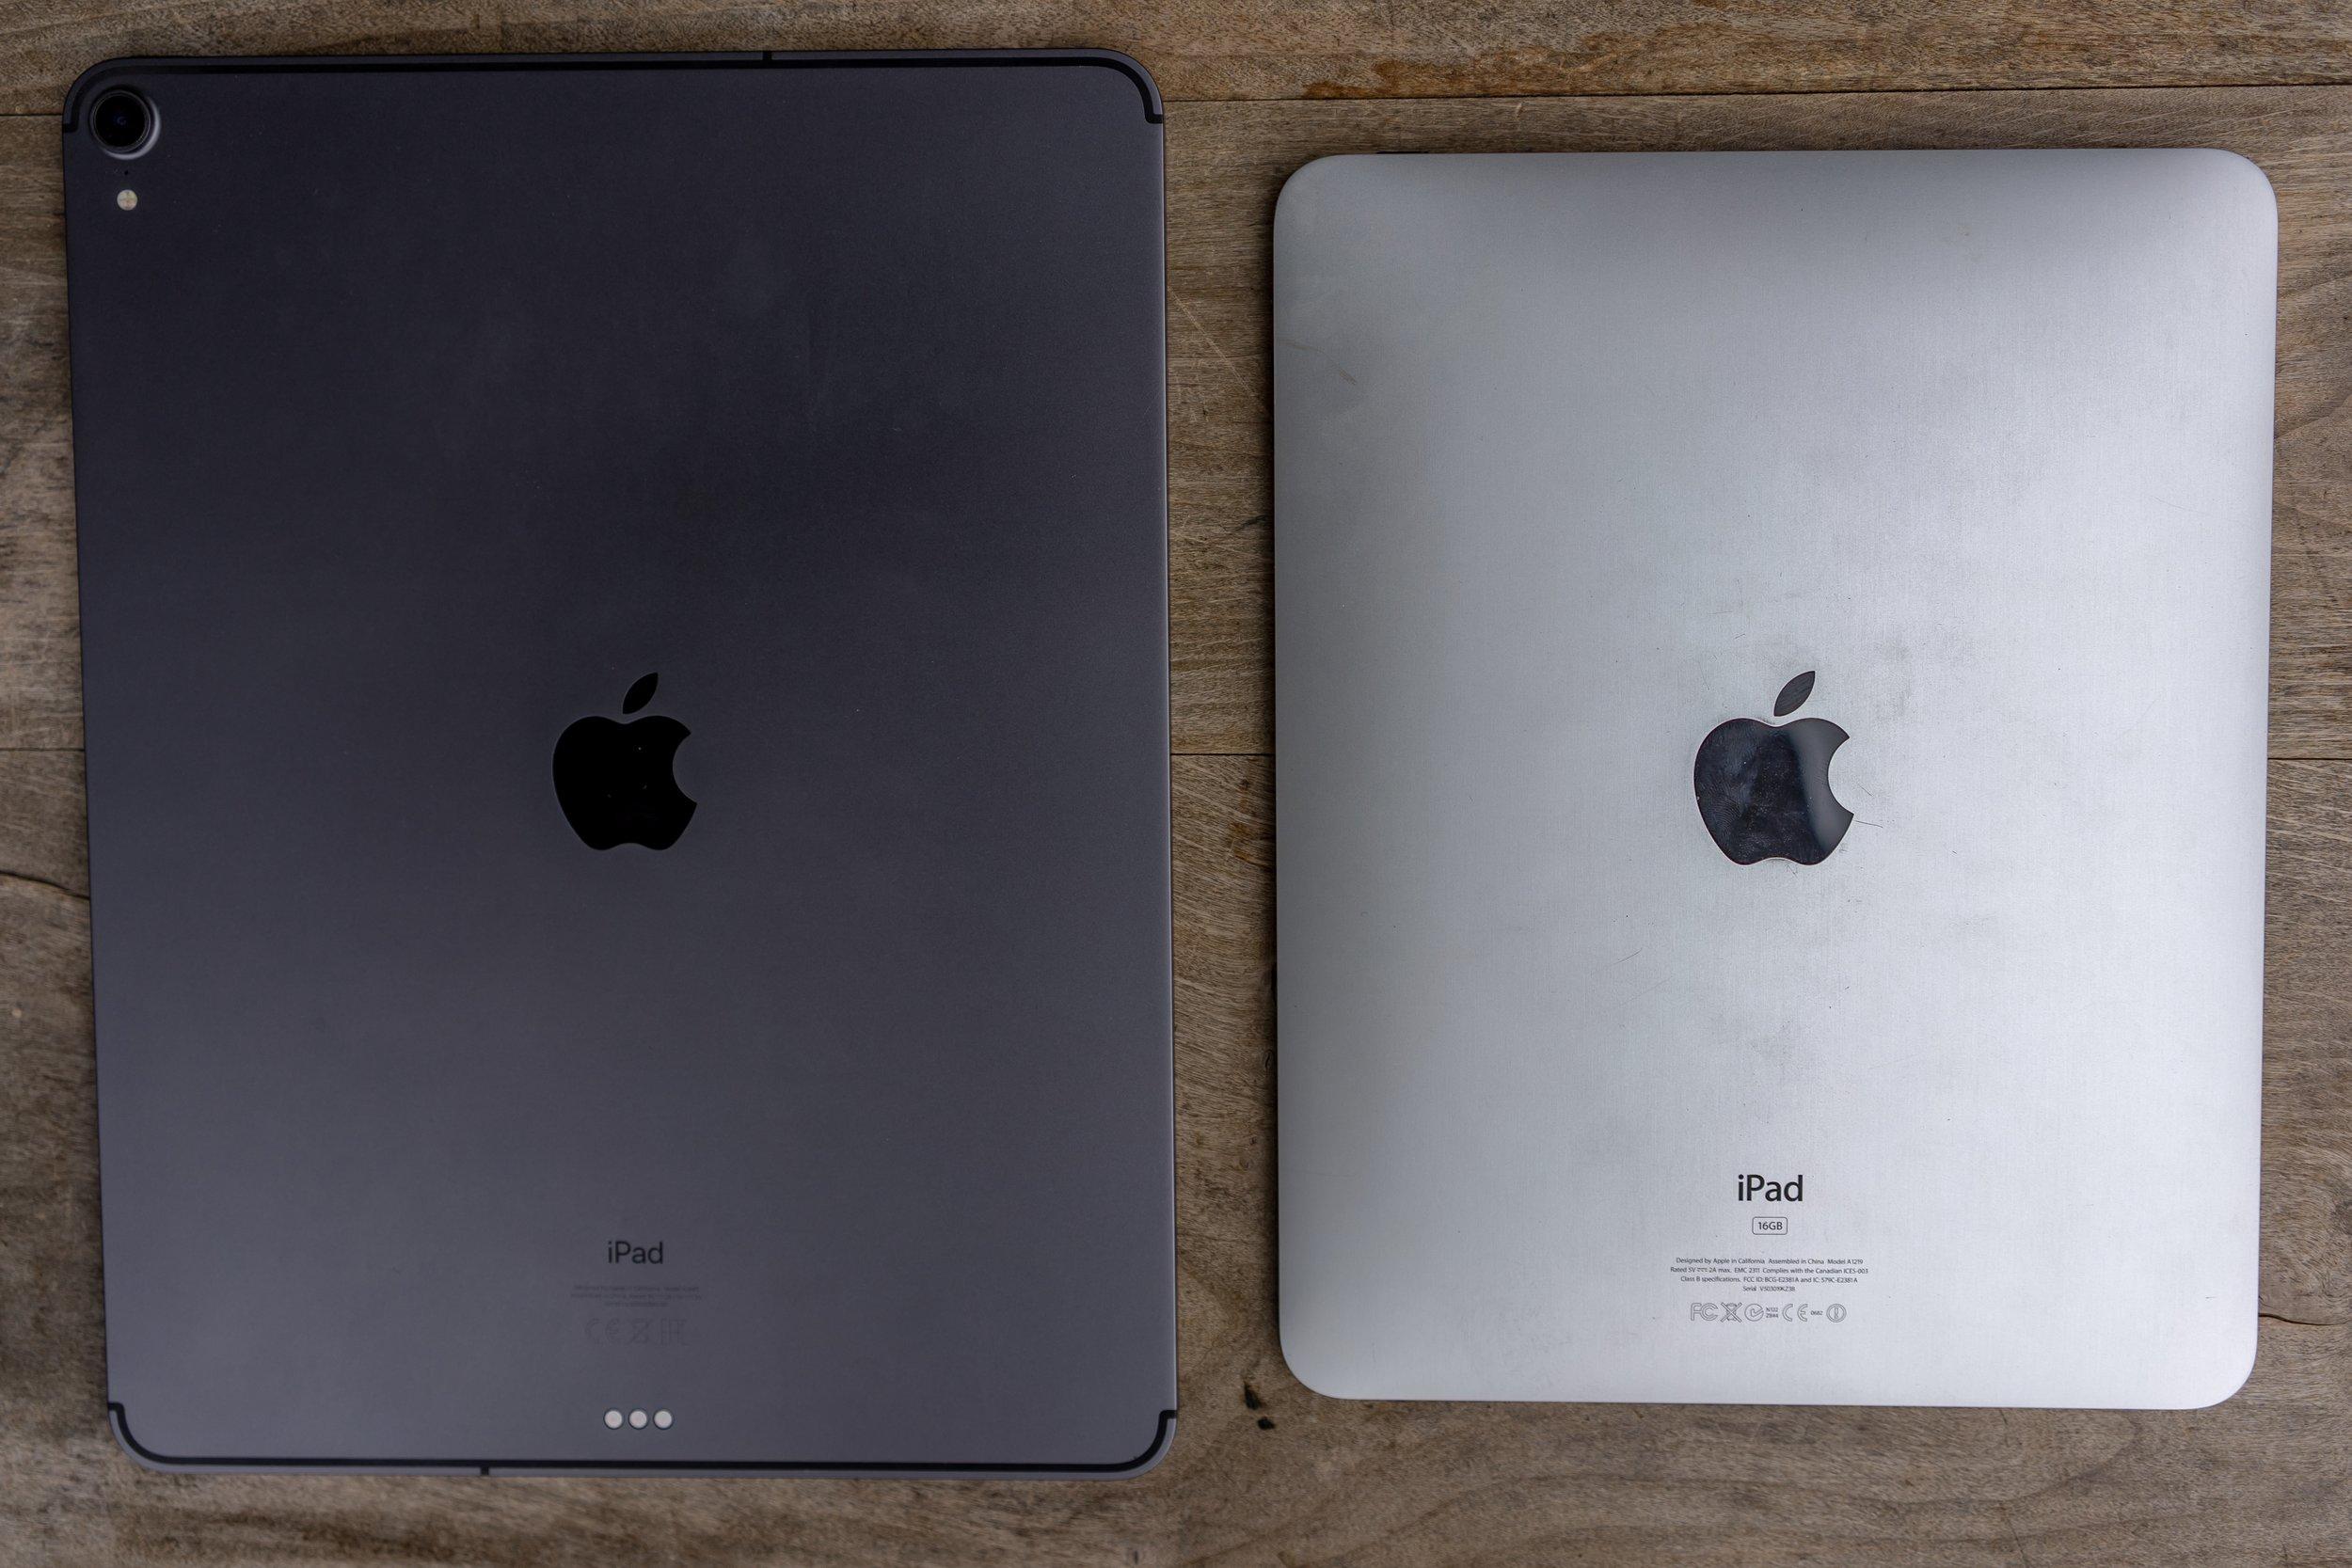 iPad Pro 12,9 (2018) and the original iPad